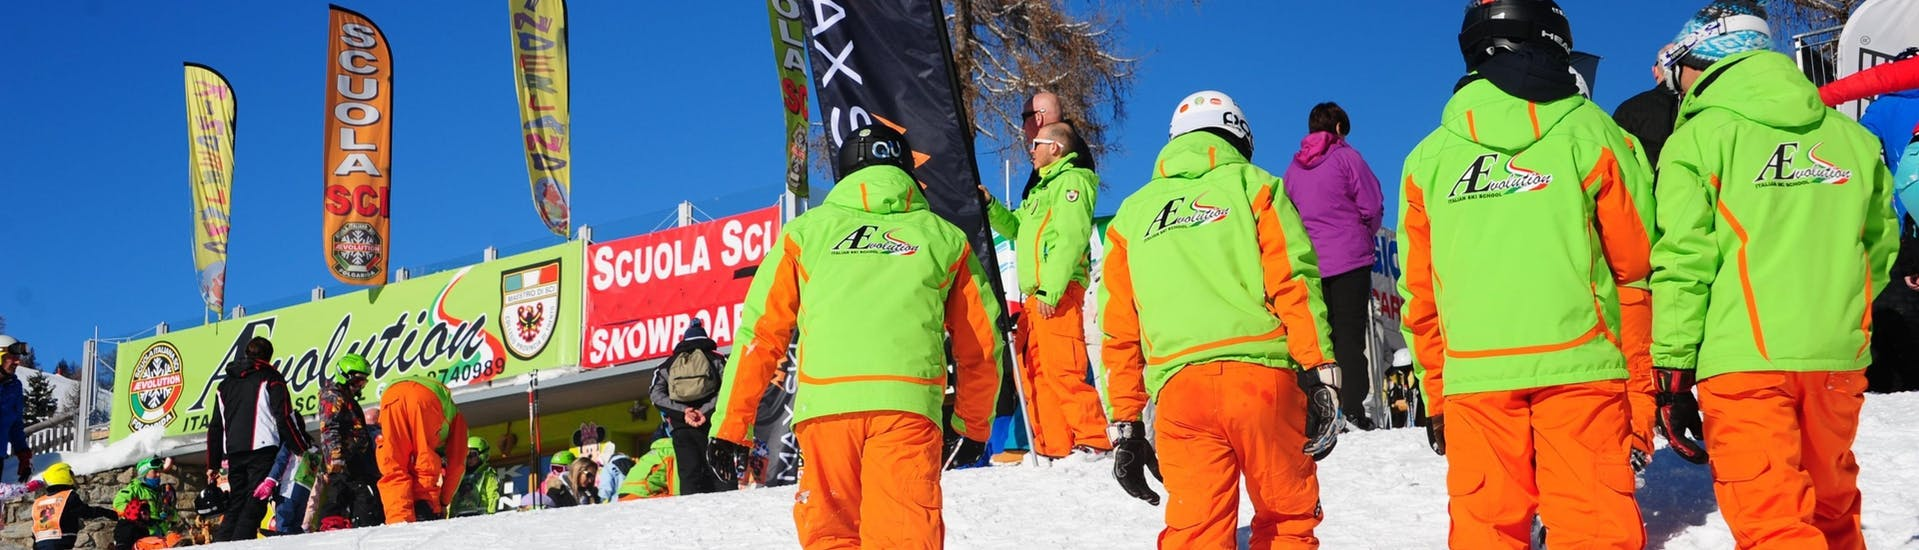 Private Freestyle Skiing Lessons - All Levels of the Ski School Scuola di Sci Aevolution Folgarida are finished, the ski instructors return to the ski school.